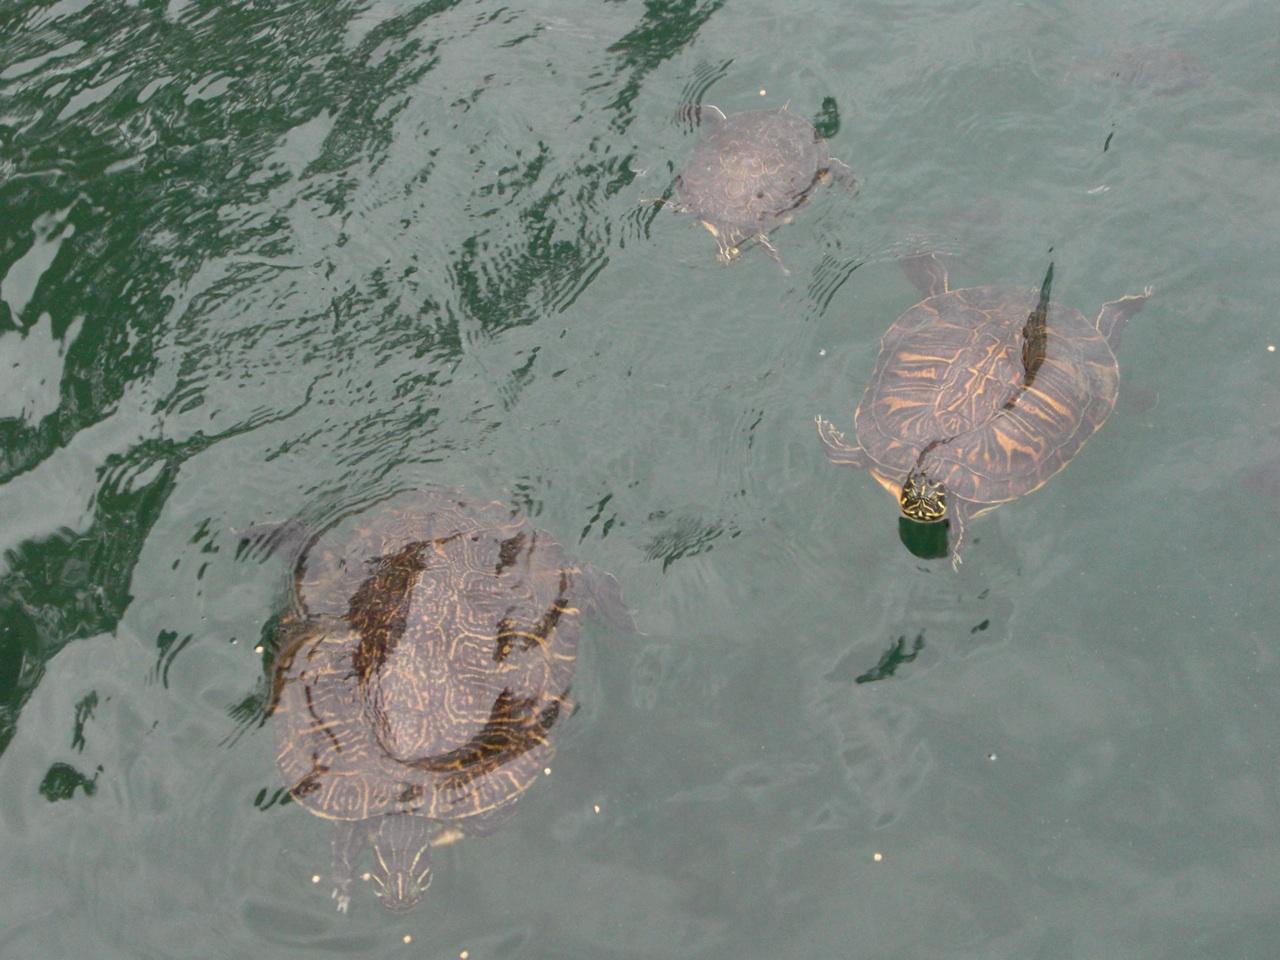 Feeding The Turtle's